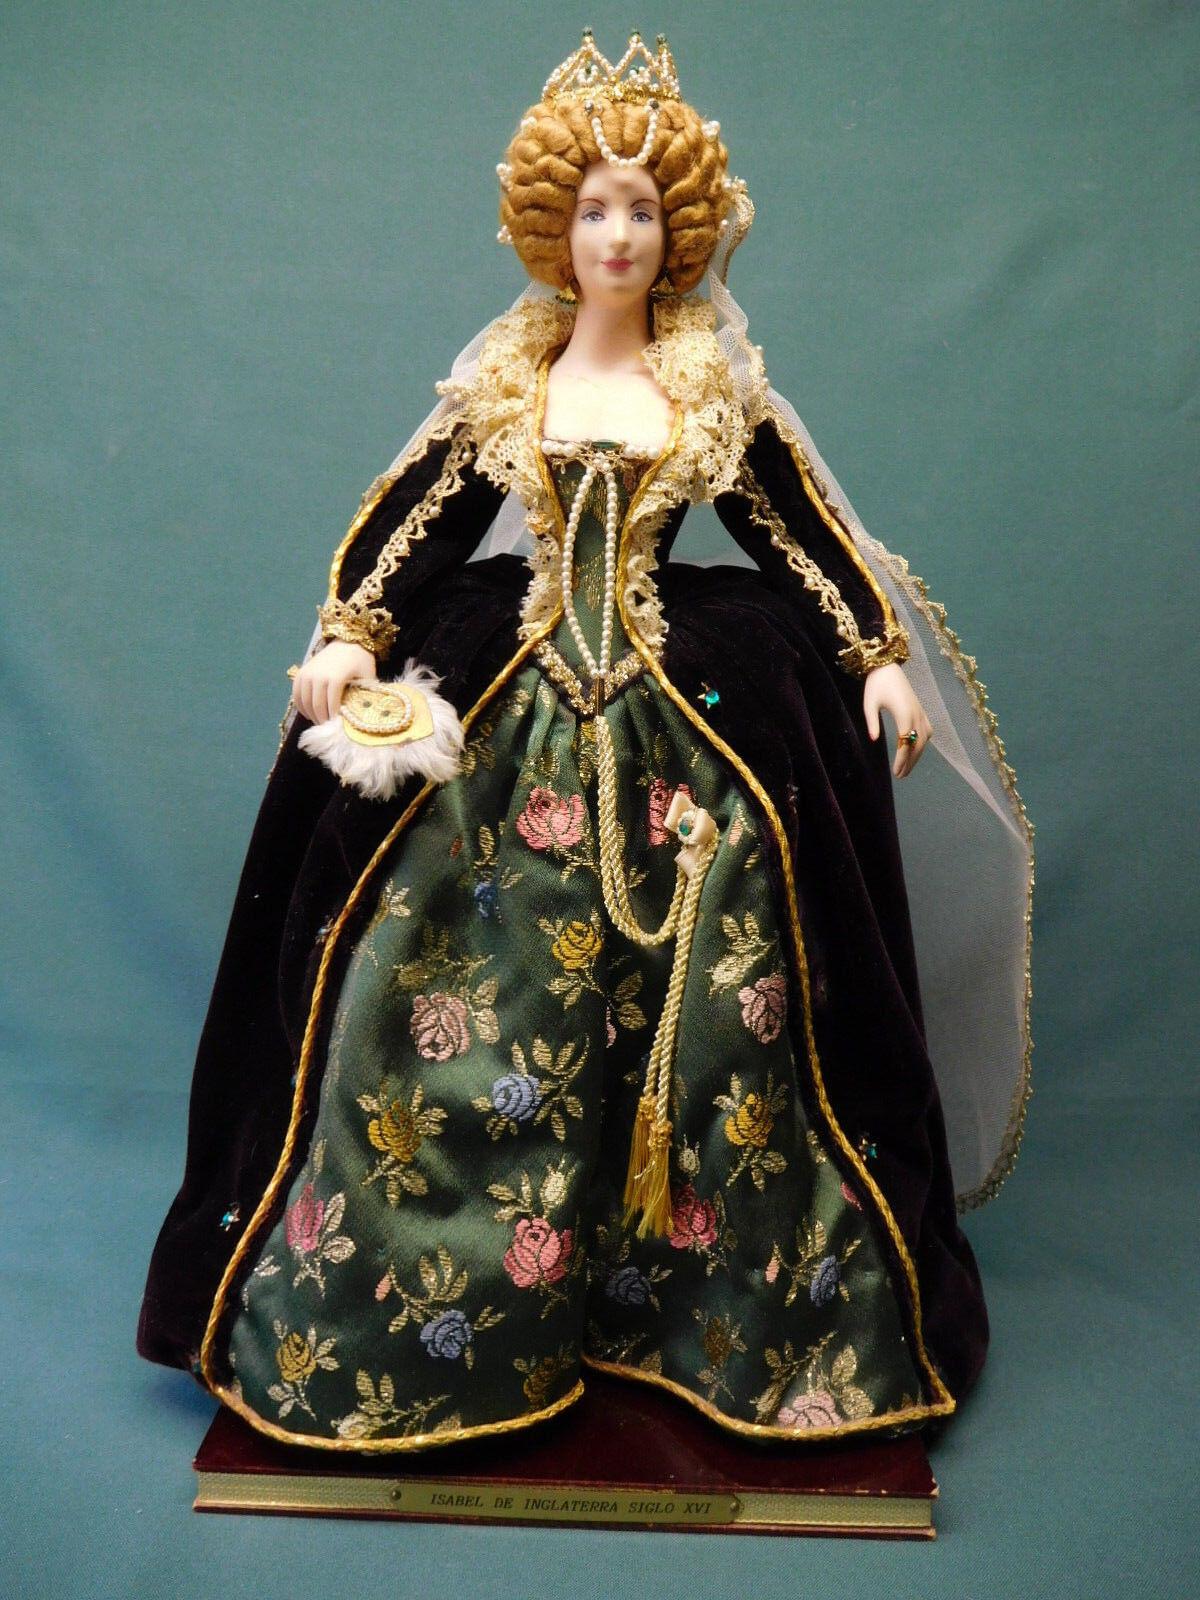 Marin Queen Isabel De Inglaterra Siglo XVI historical doll 171 7